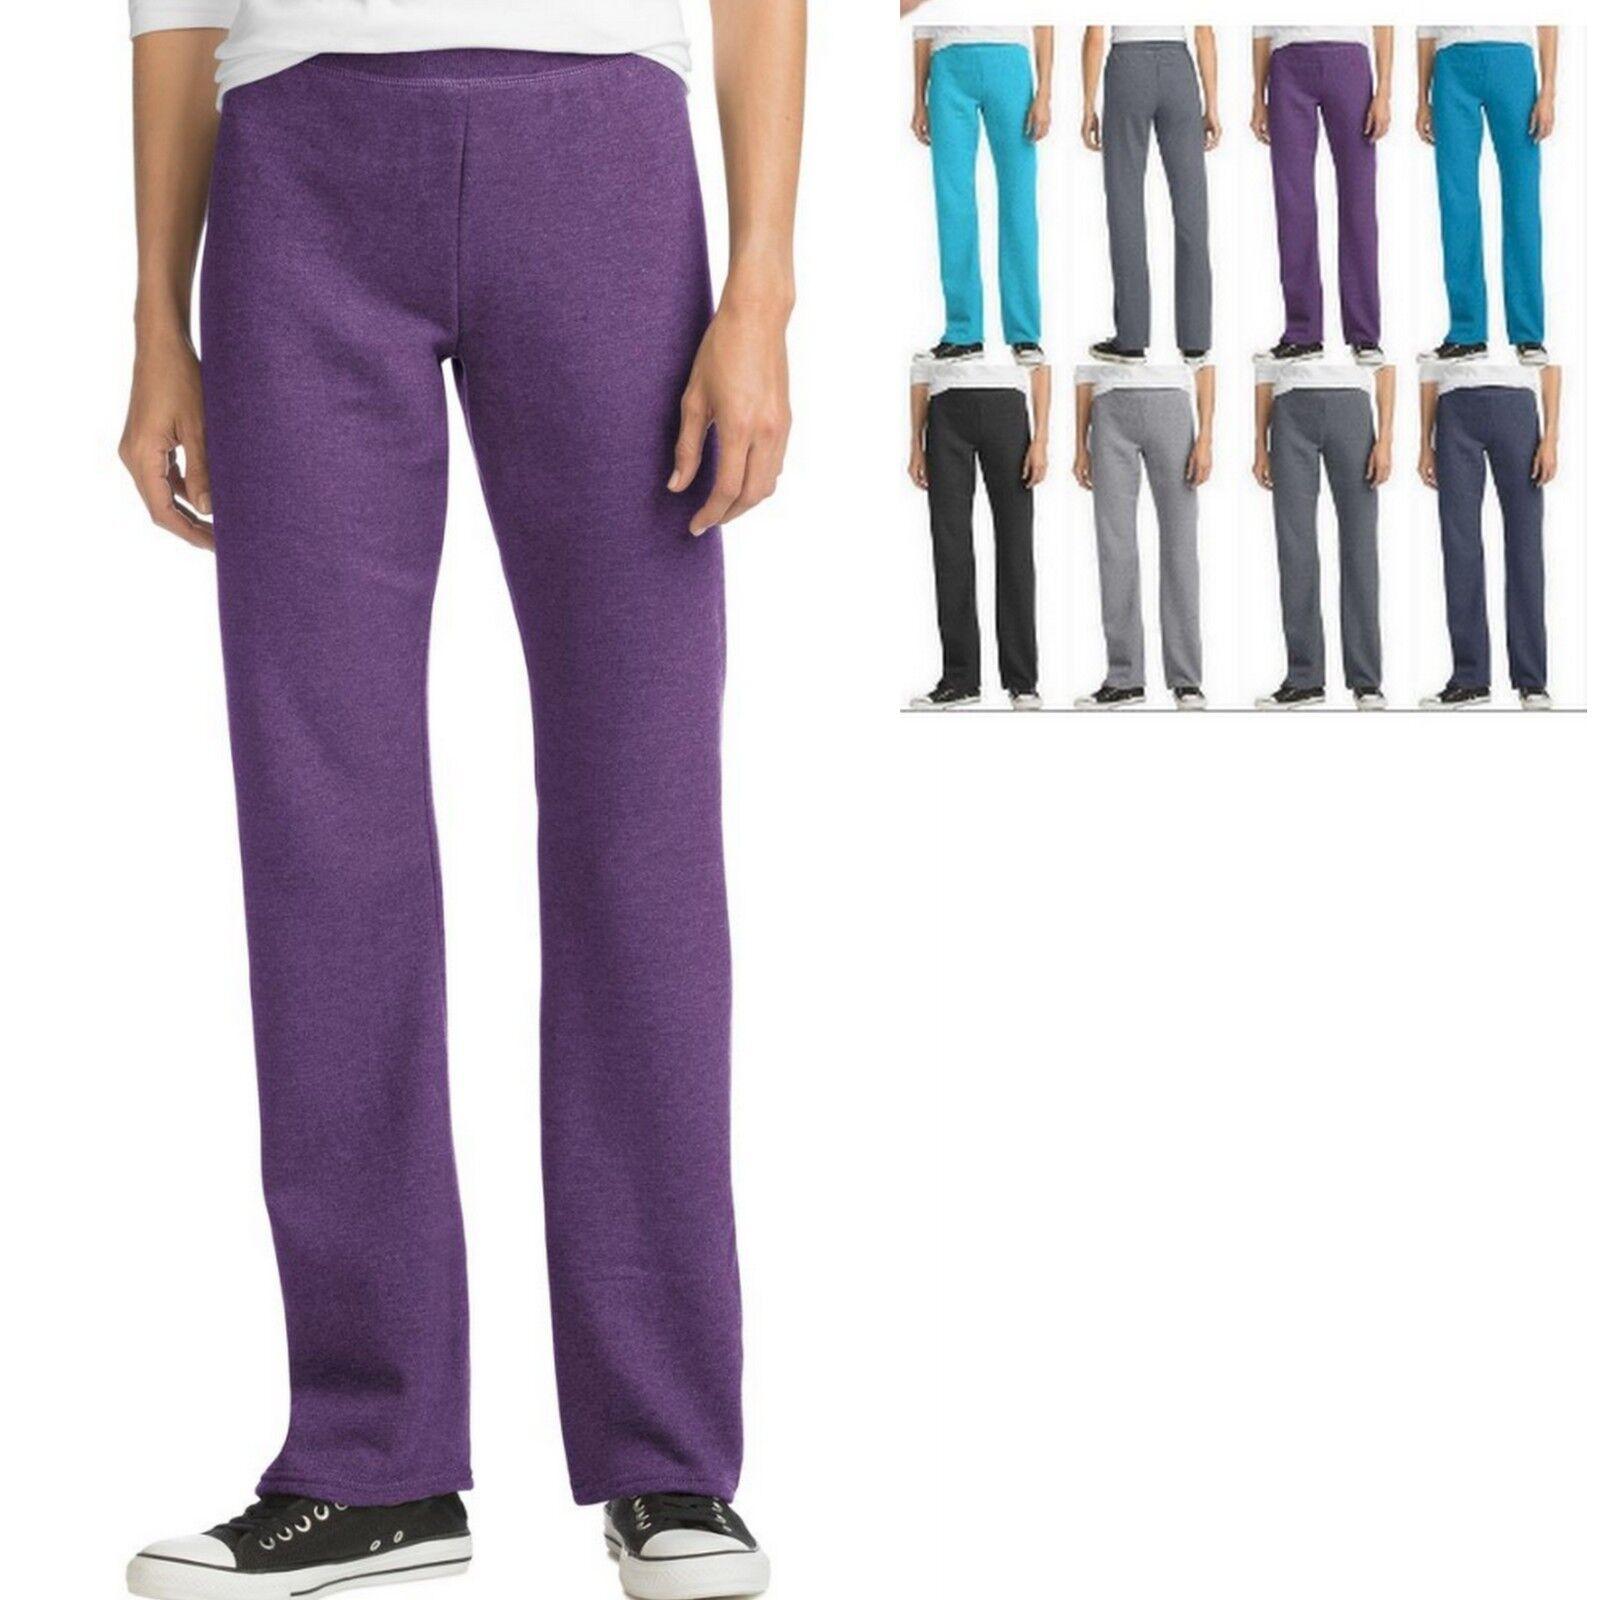 Hanes Women's Open Leg Sweatpants O4629 - BUY TWO GET THIRD